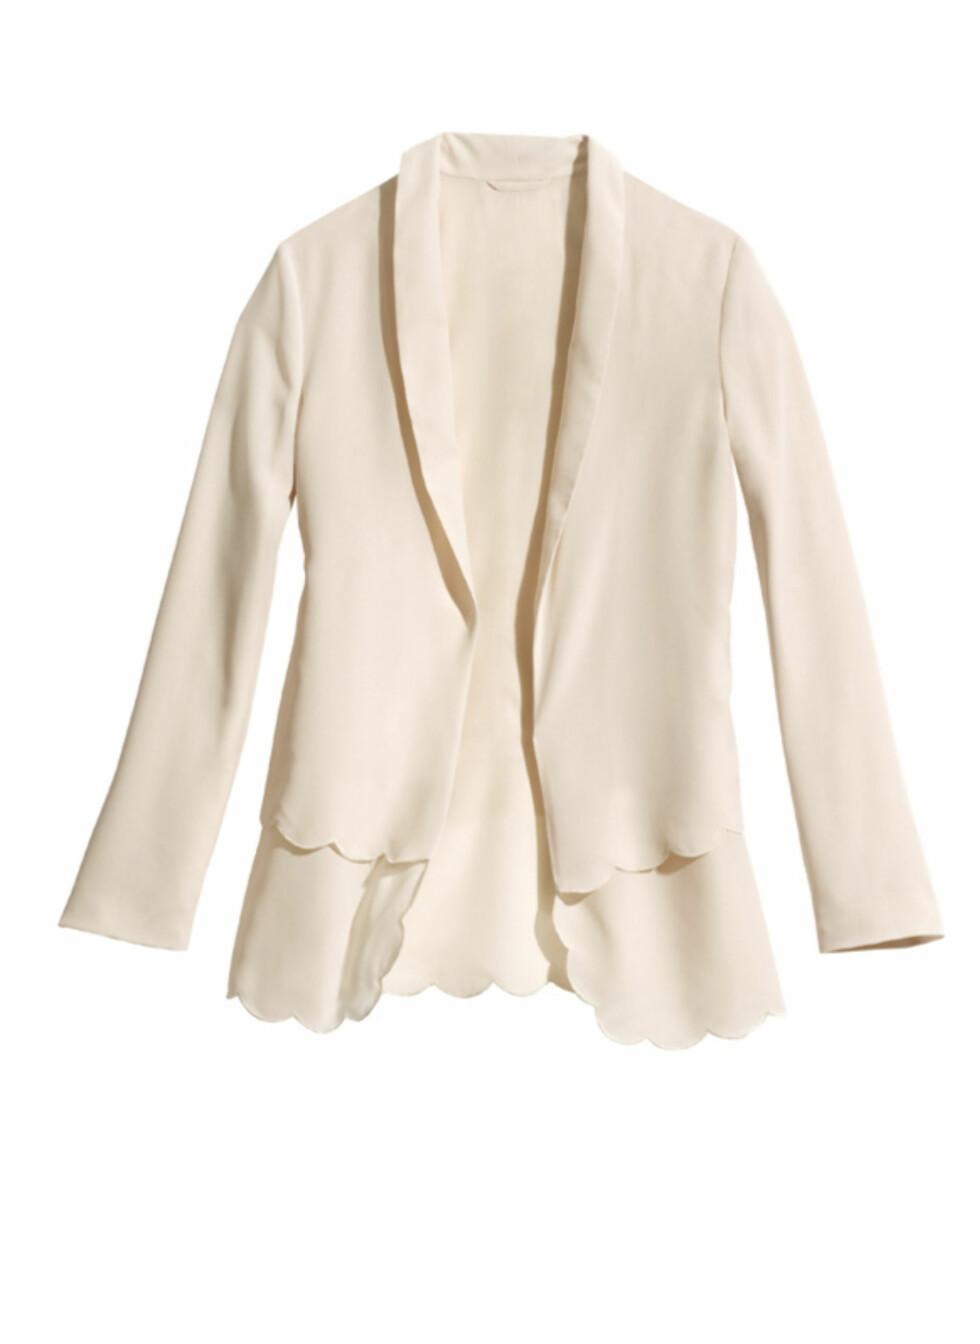 Feminin pudderrosa blazer (kr.399). Foto: H&M